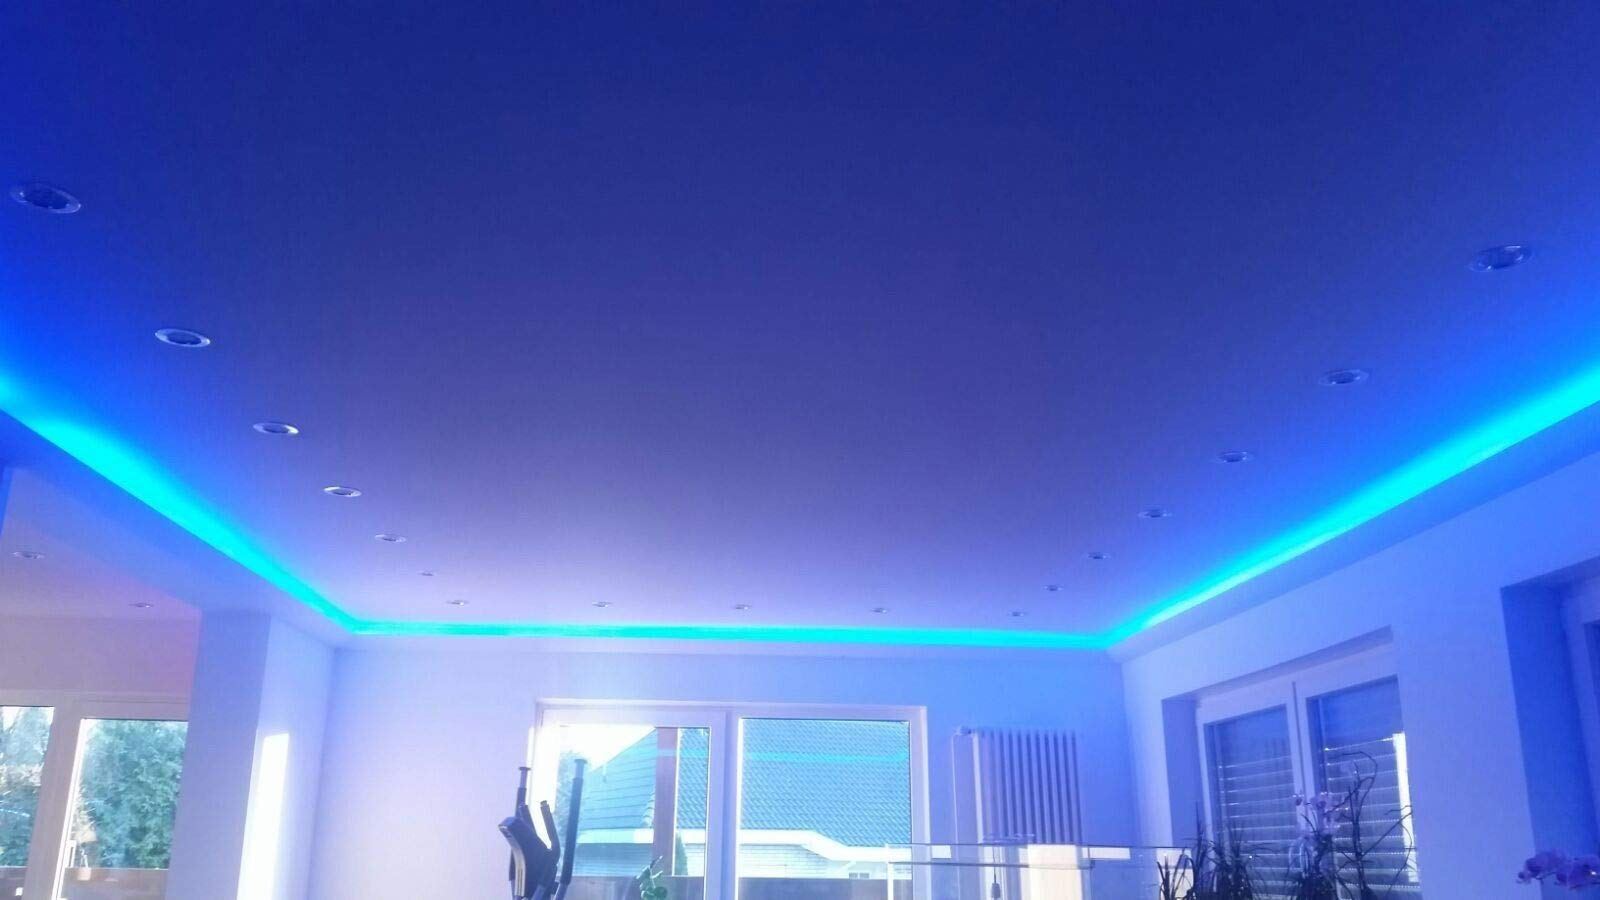 BL 04 26 m + 5 esquinas Perfil de iluminaci/ón LED para techo